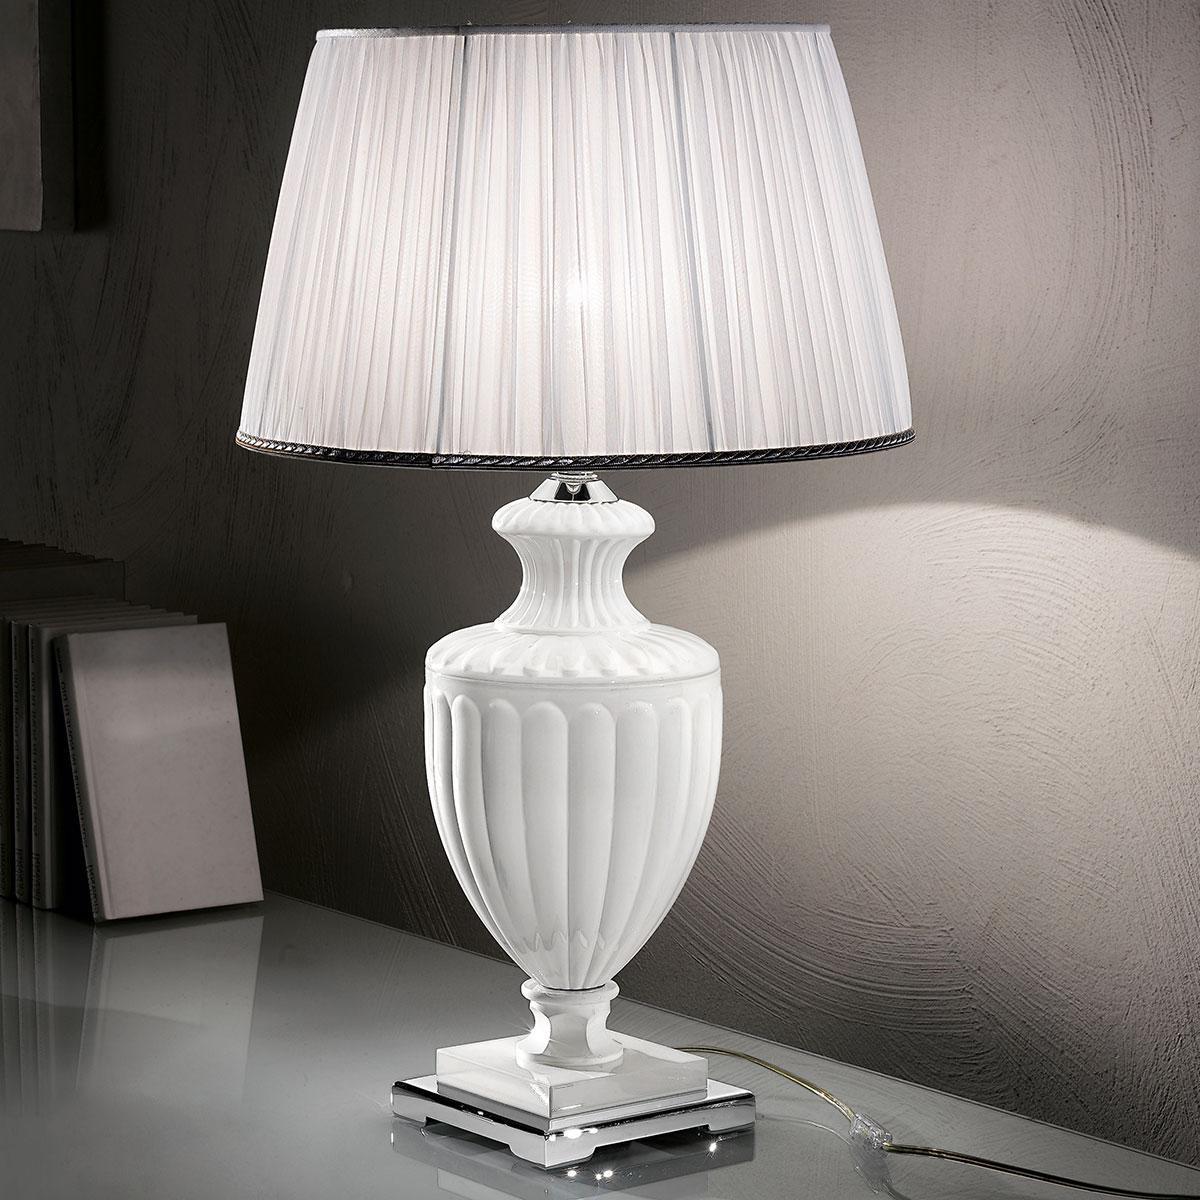 """Burri"" lampara de sobremesa veneciana en cristal - 1 luce - blanco"